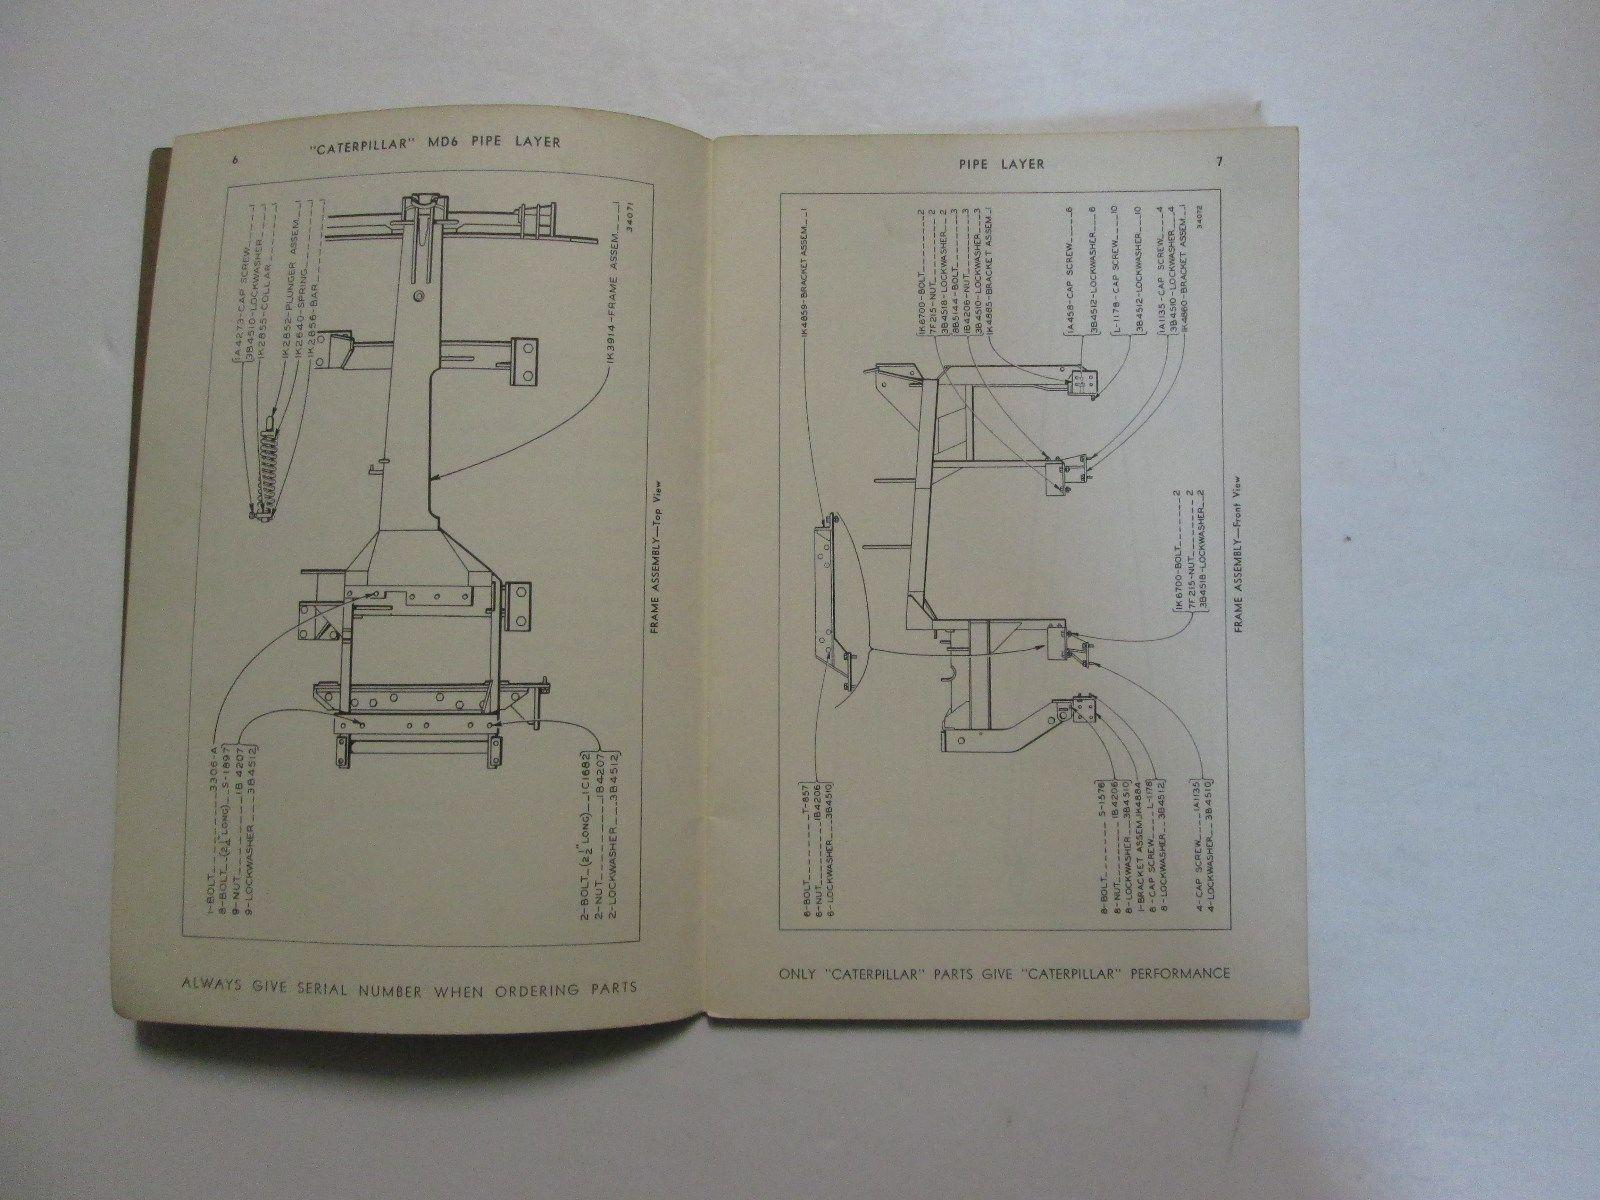 Caterpillar MD6 Pipelayer Parts Catalog Manual USED OEM CATERPILLAR md6